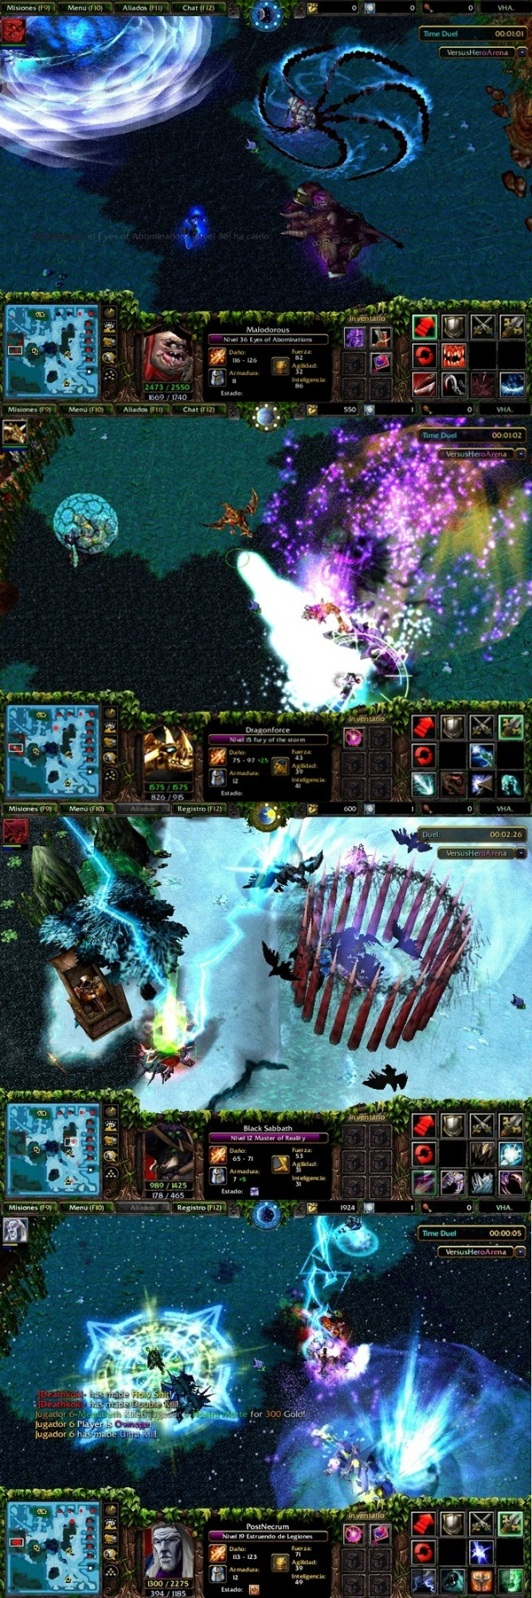 Versus+Hero+Arena+3.jpg